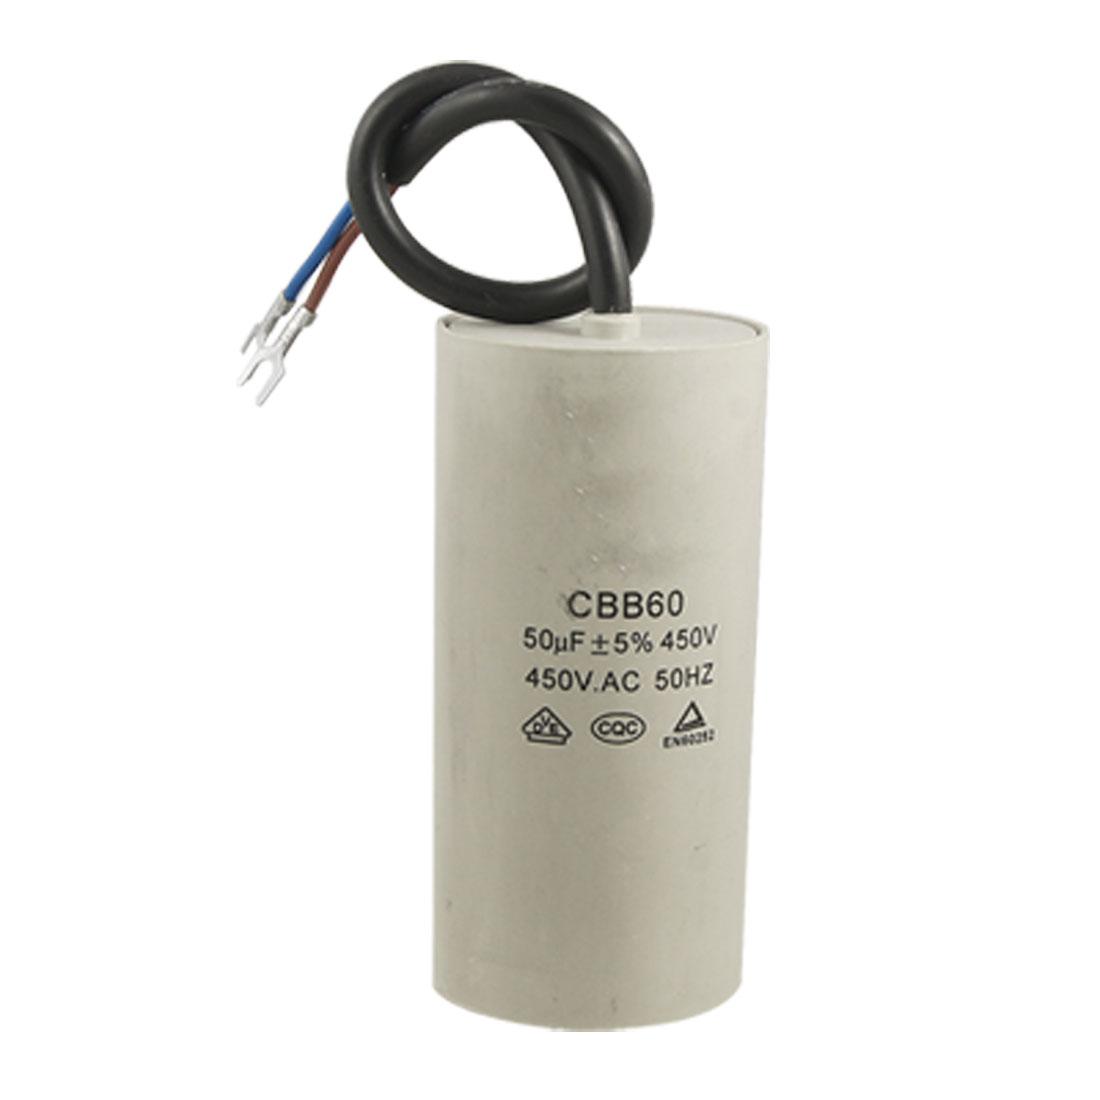 CBB60 50uF Wire Lead Cylinder Motor Run Capacitor AC 450V